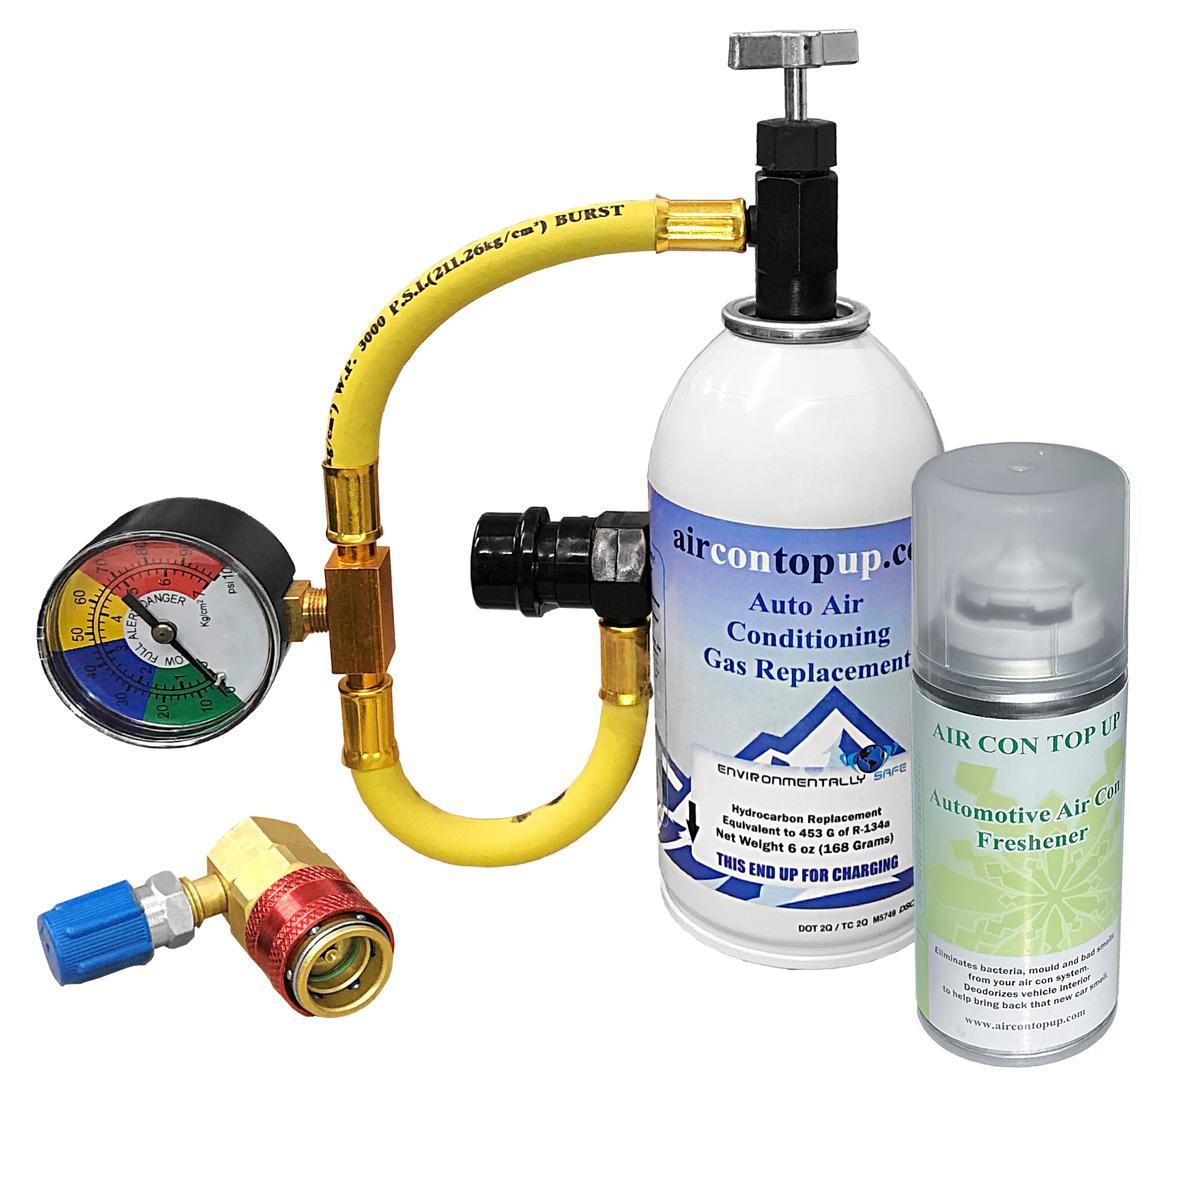 Car AC Aircon Top up Gas Refill Regas DIY Kit +High/Low Side Port +Sanitiser Can